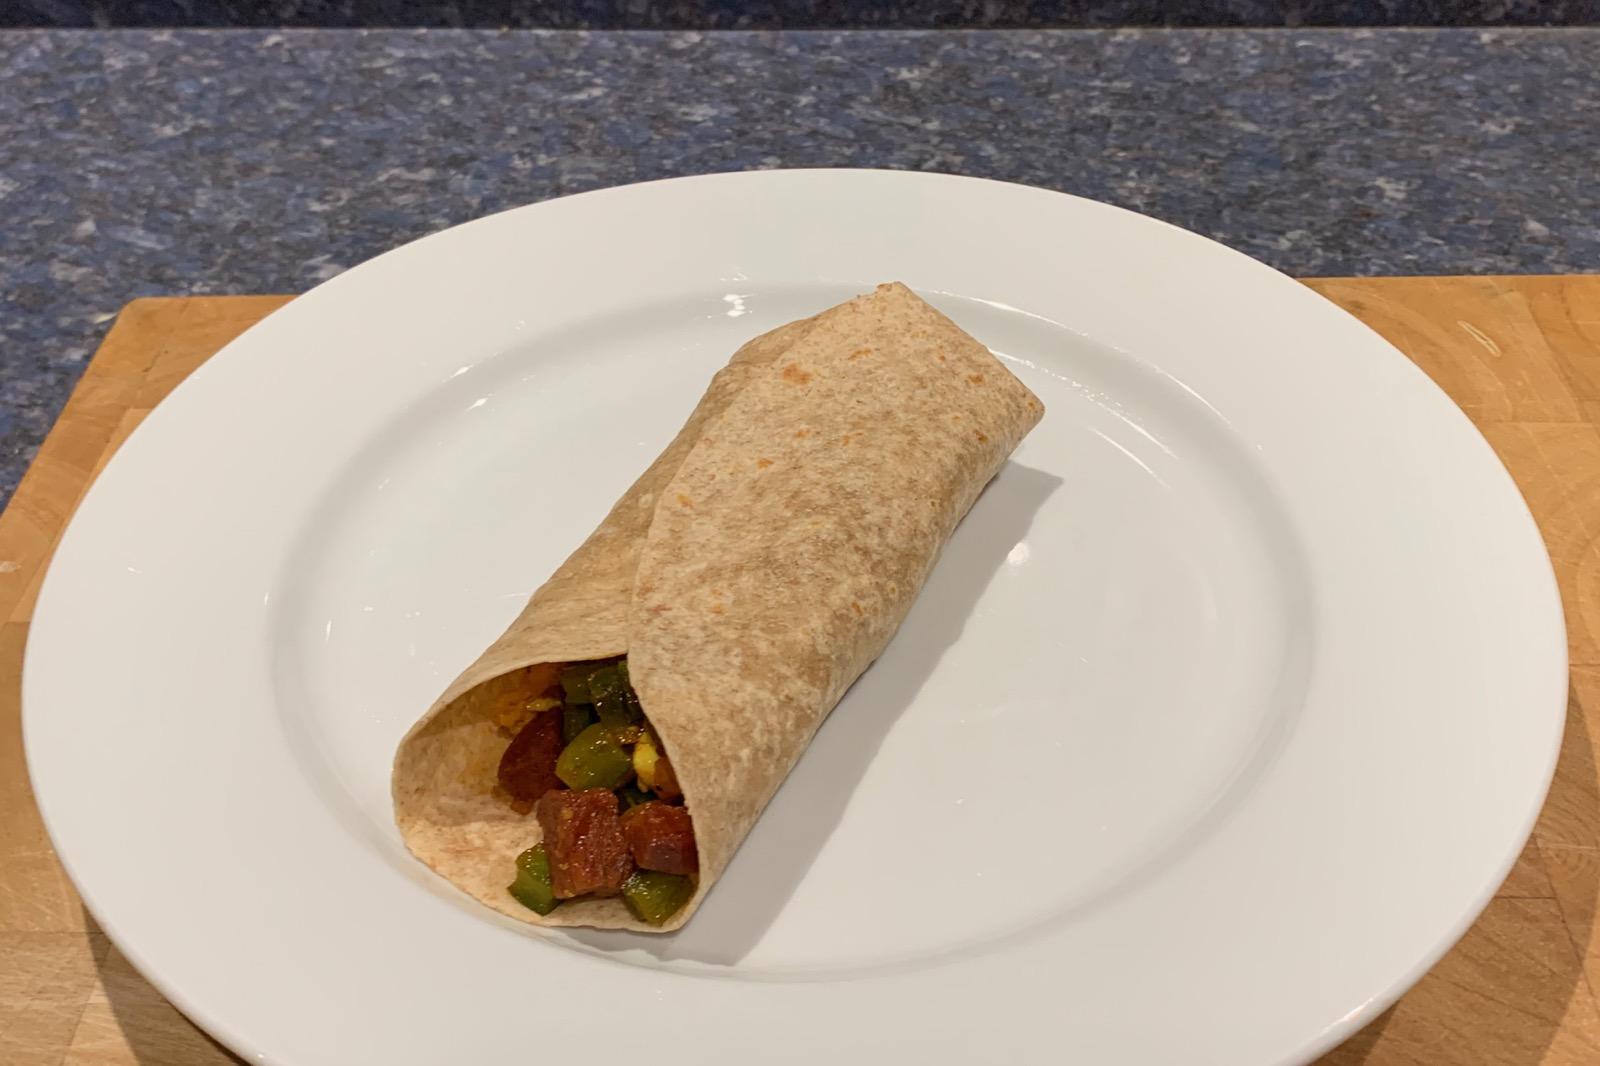 http://blog.rickk.com/food/2020/04/29/ate.2020.04.29.b.jpg